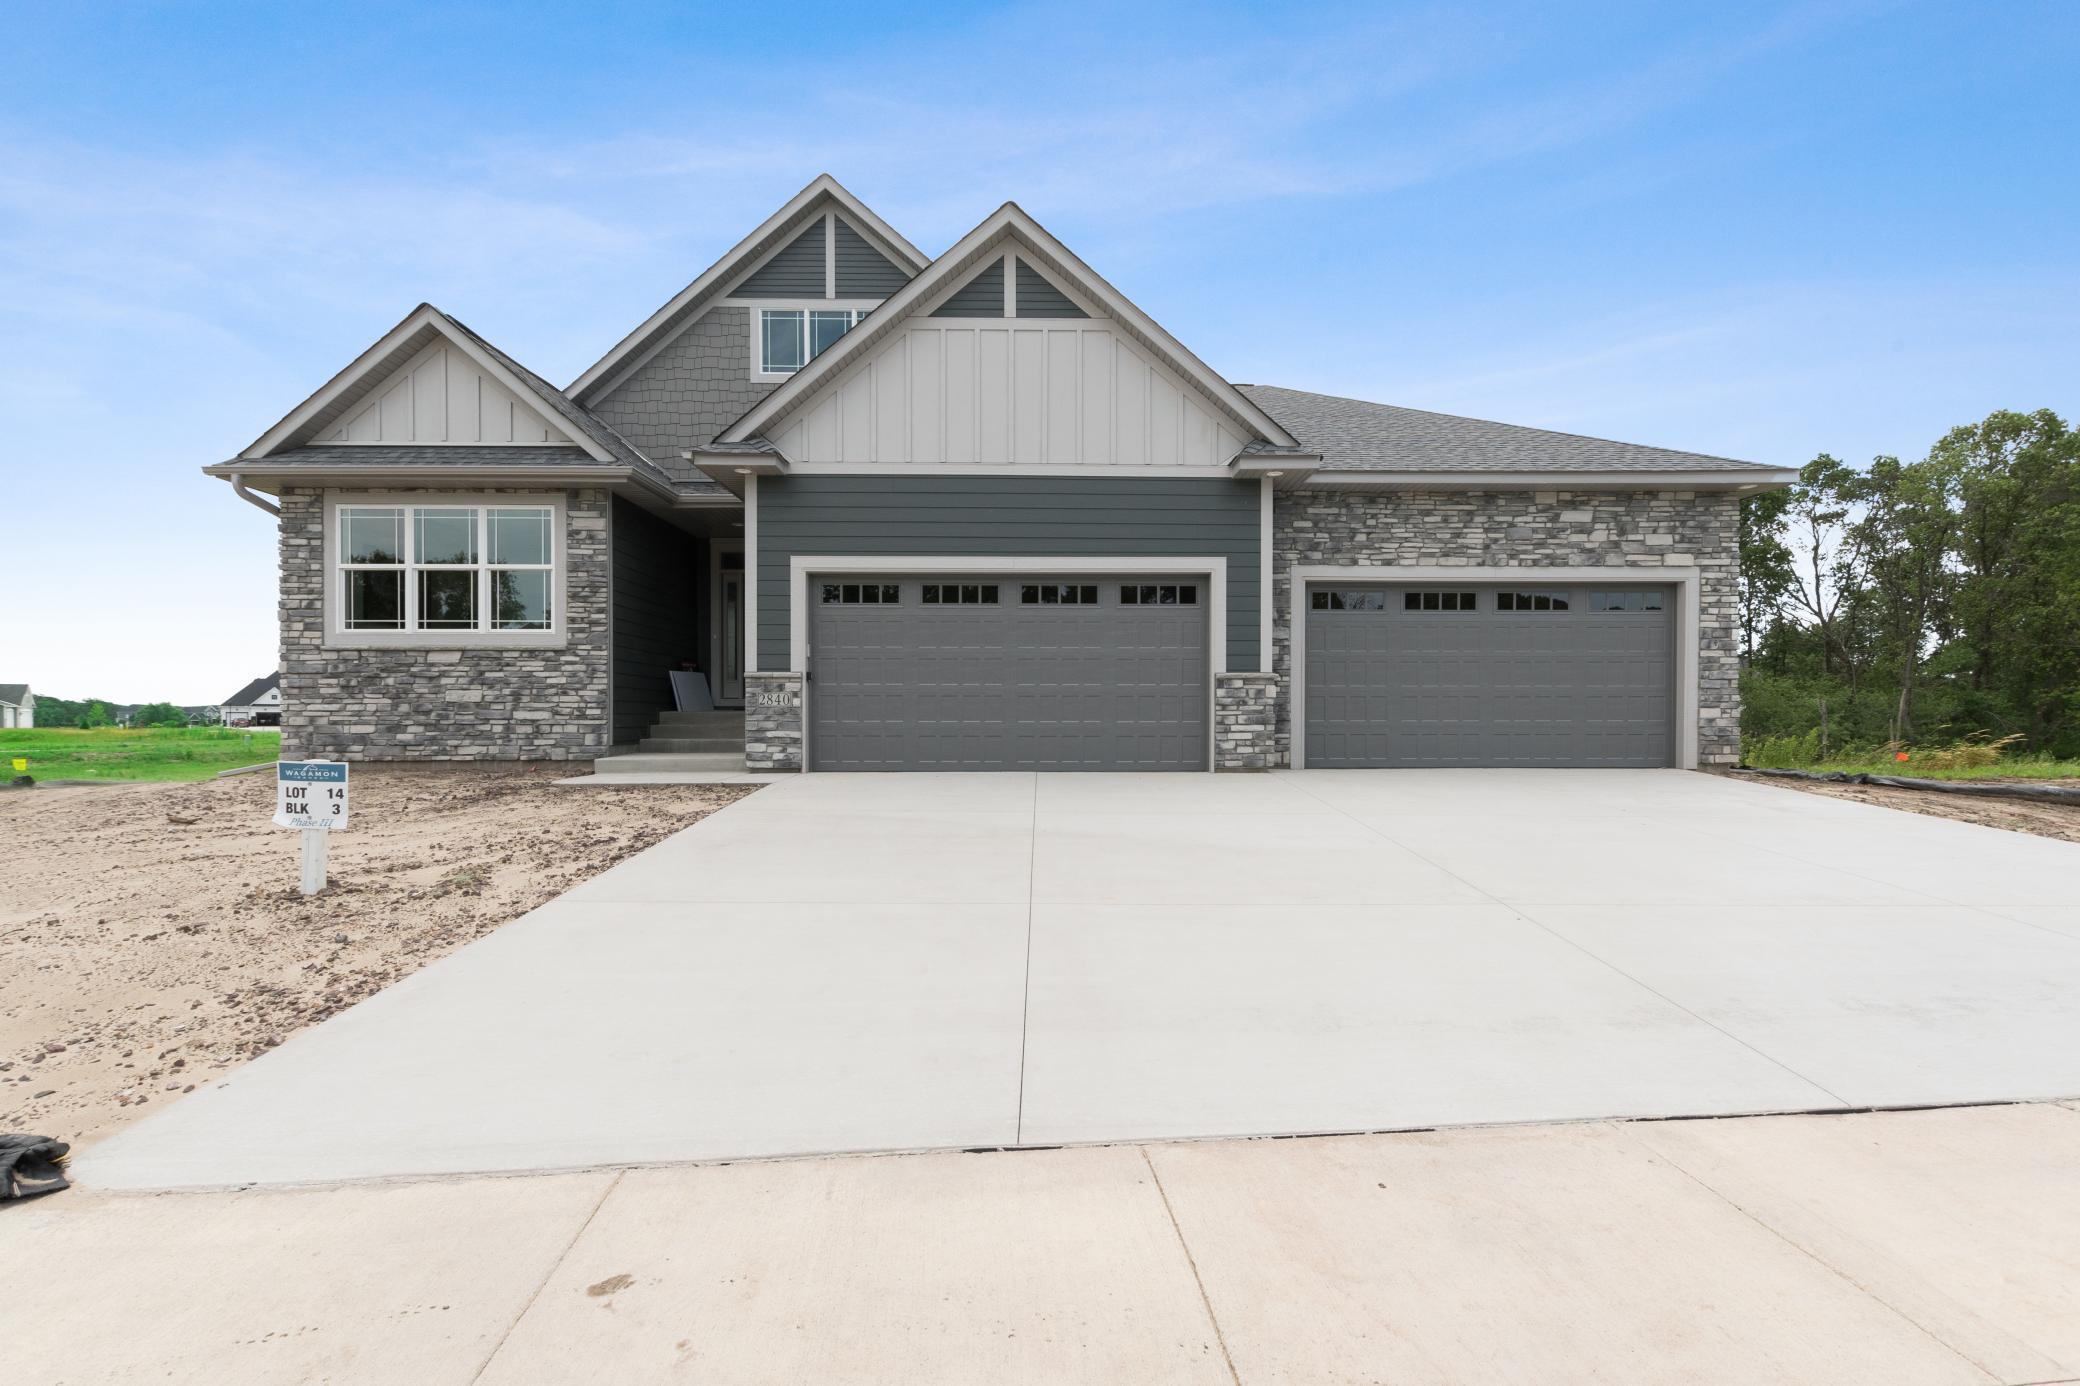 2840 132nd Avenue NE, Blaine in Anoka County, MN 55449 Home for Sale